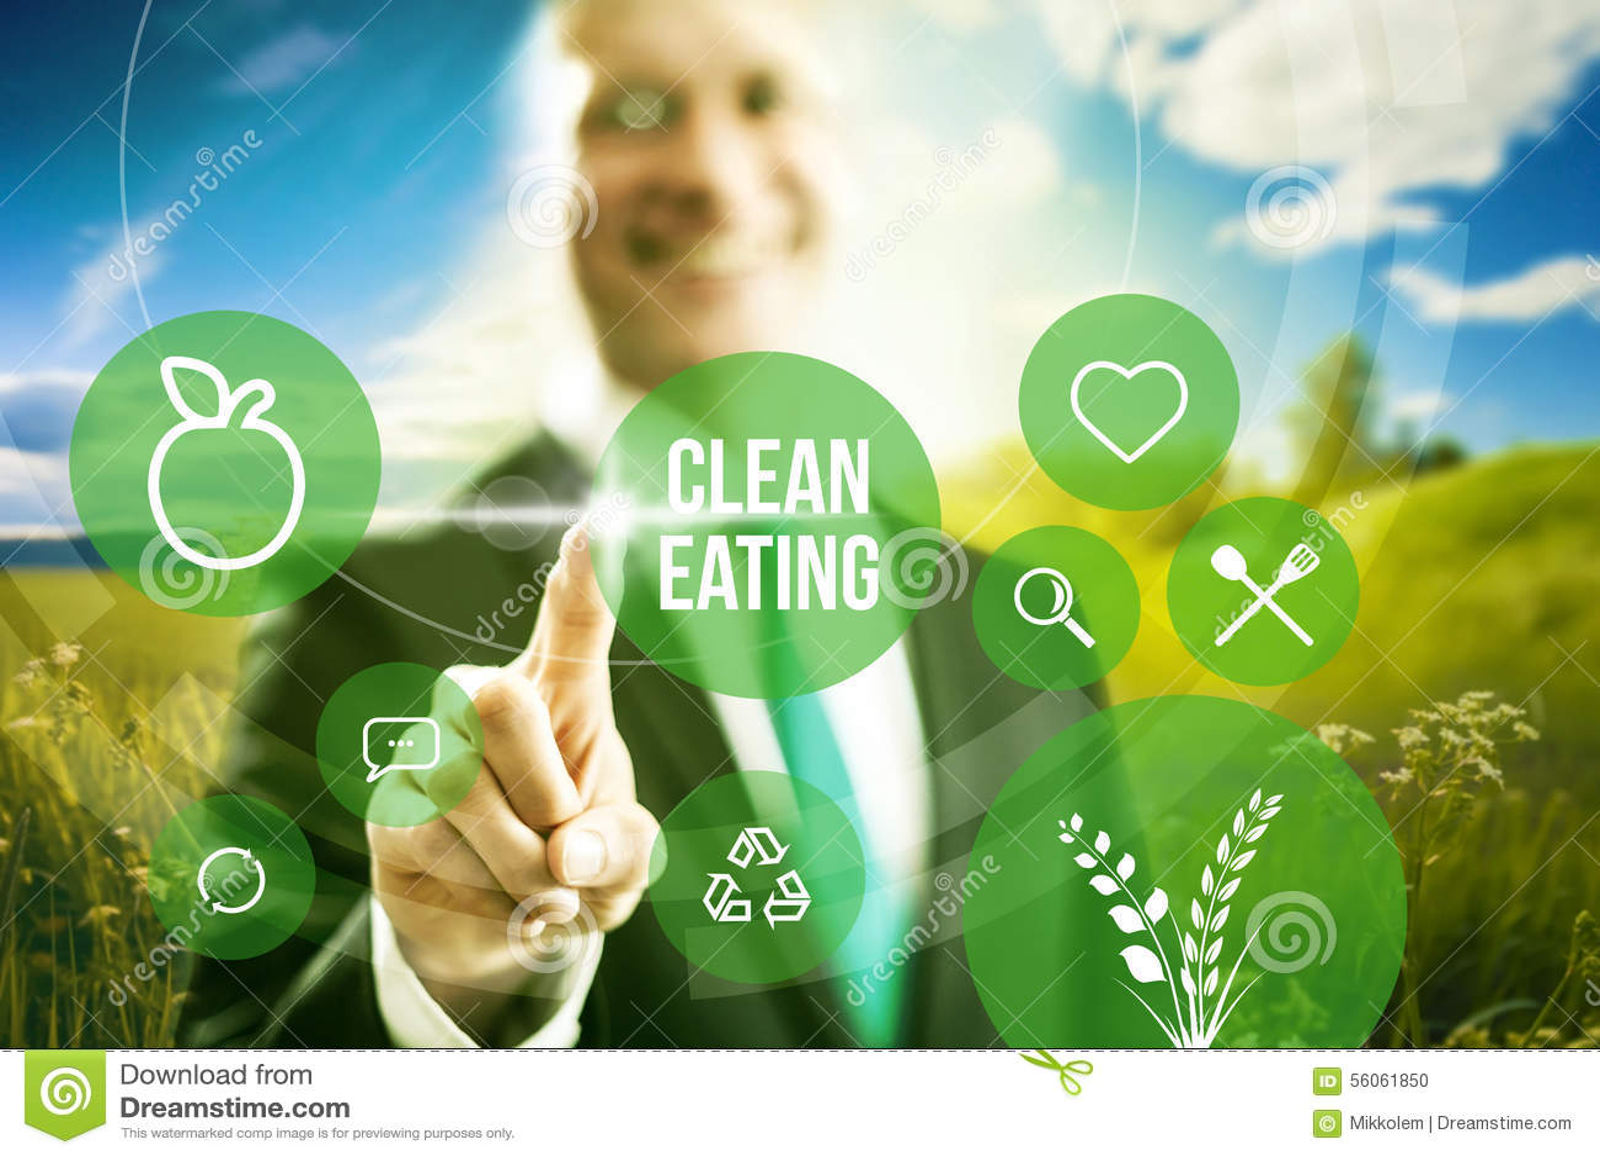 Green food industry